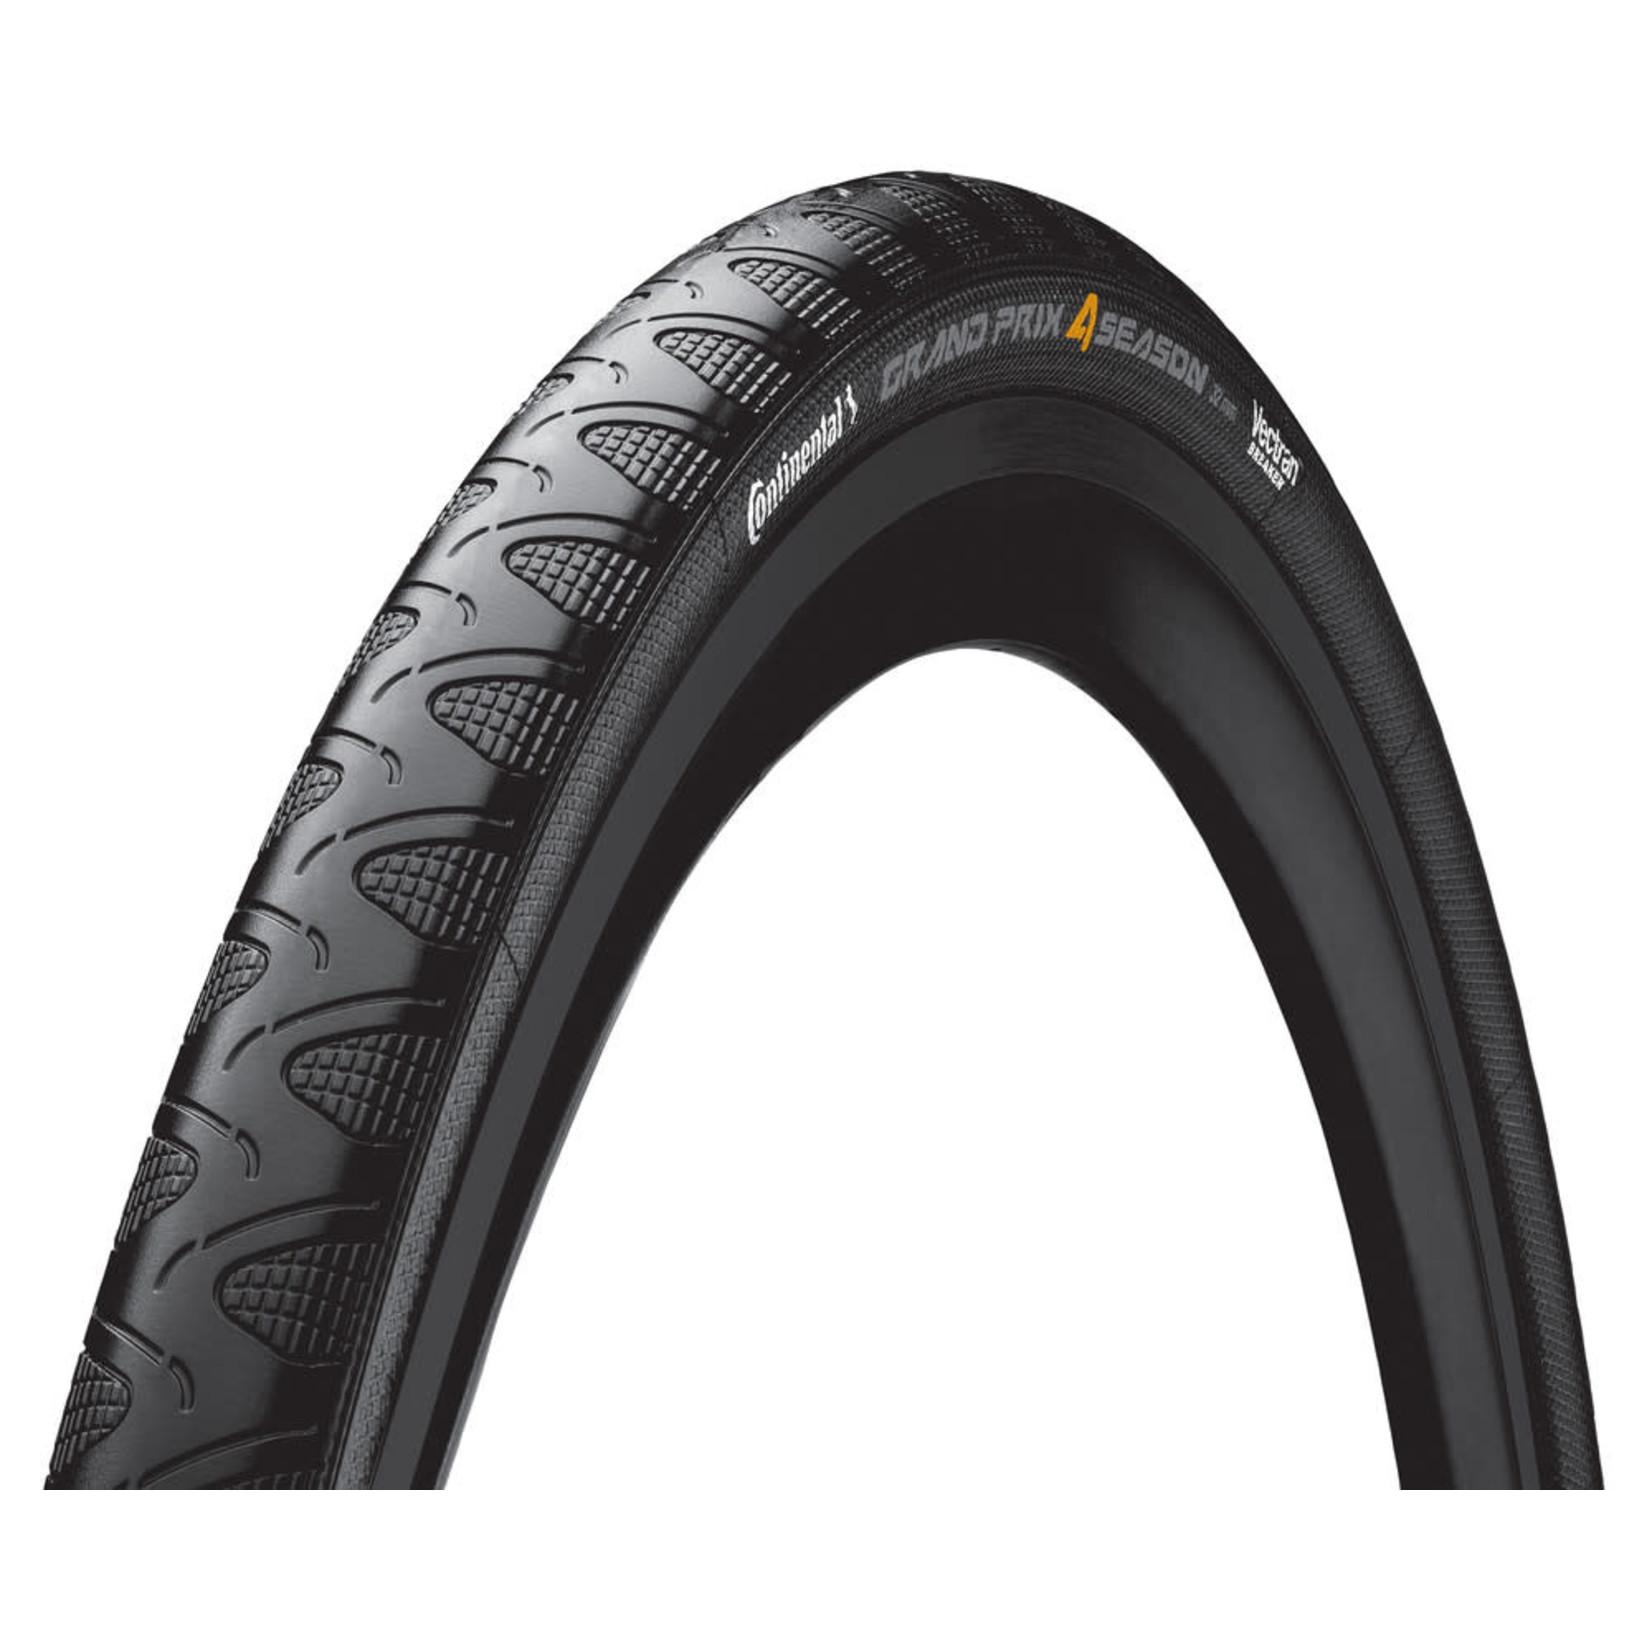 Continental Continental Grand Prix 4 Season Fold Duraskin Tire